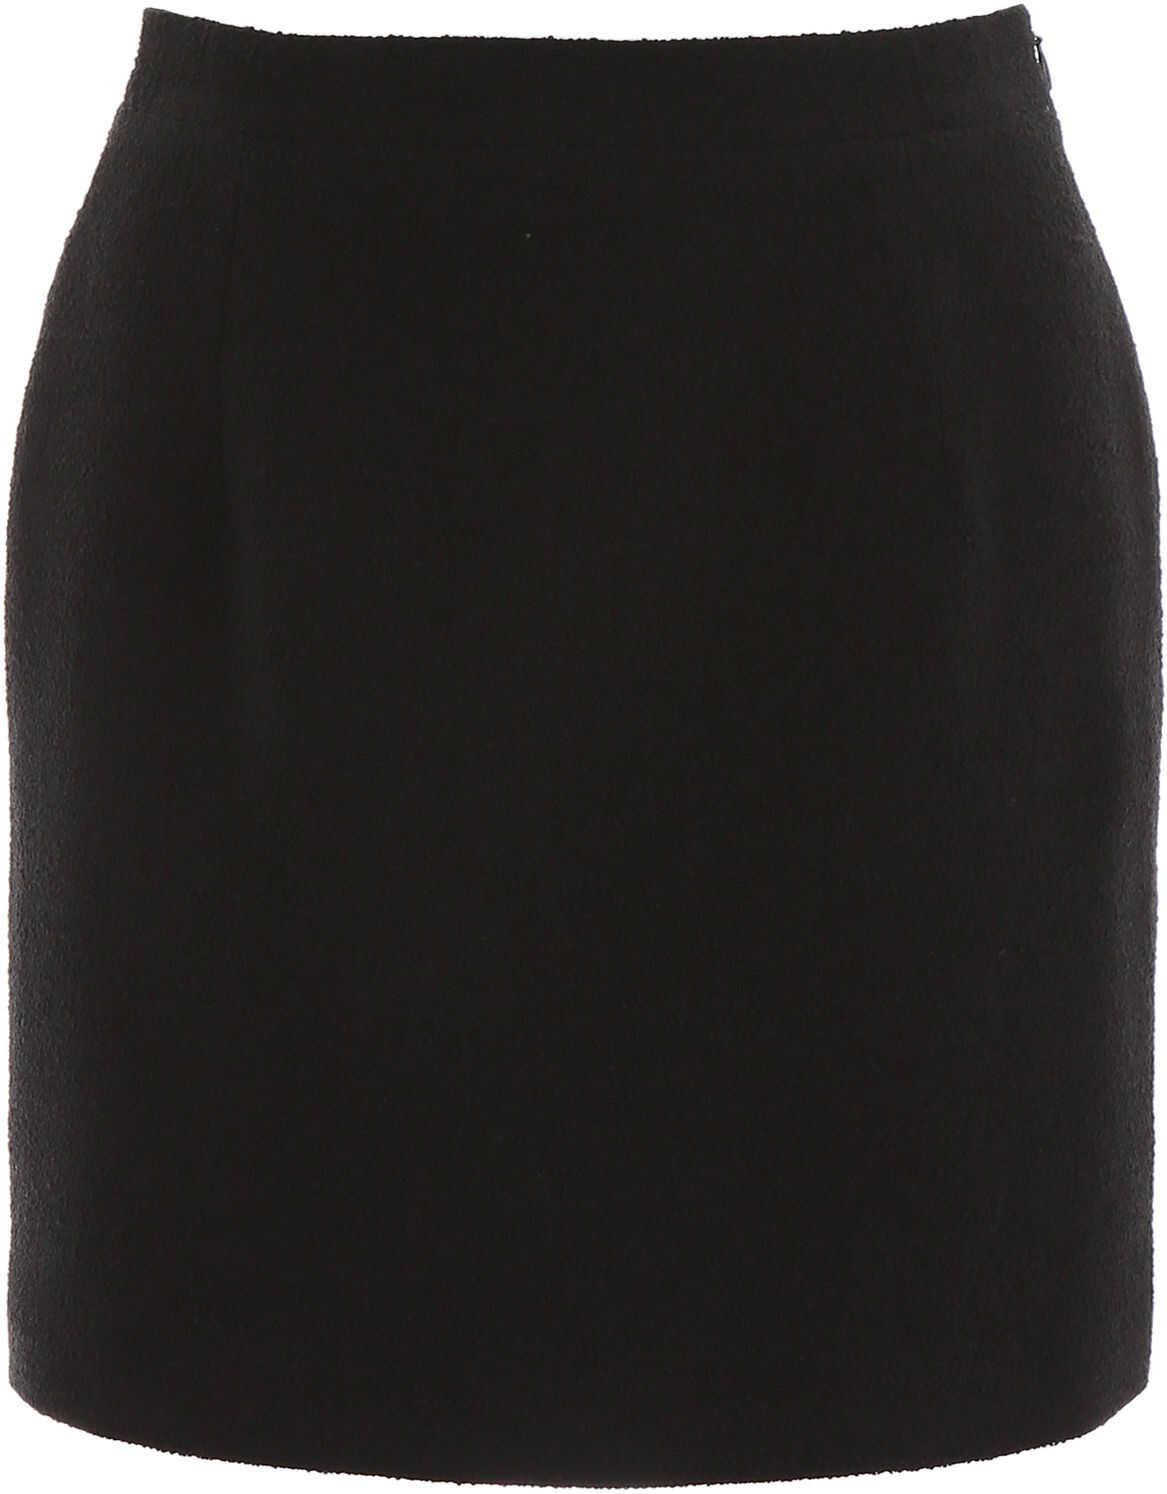 Alessandra Rich Tweed Mini Skirt BLACK